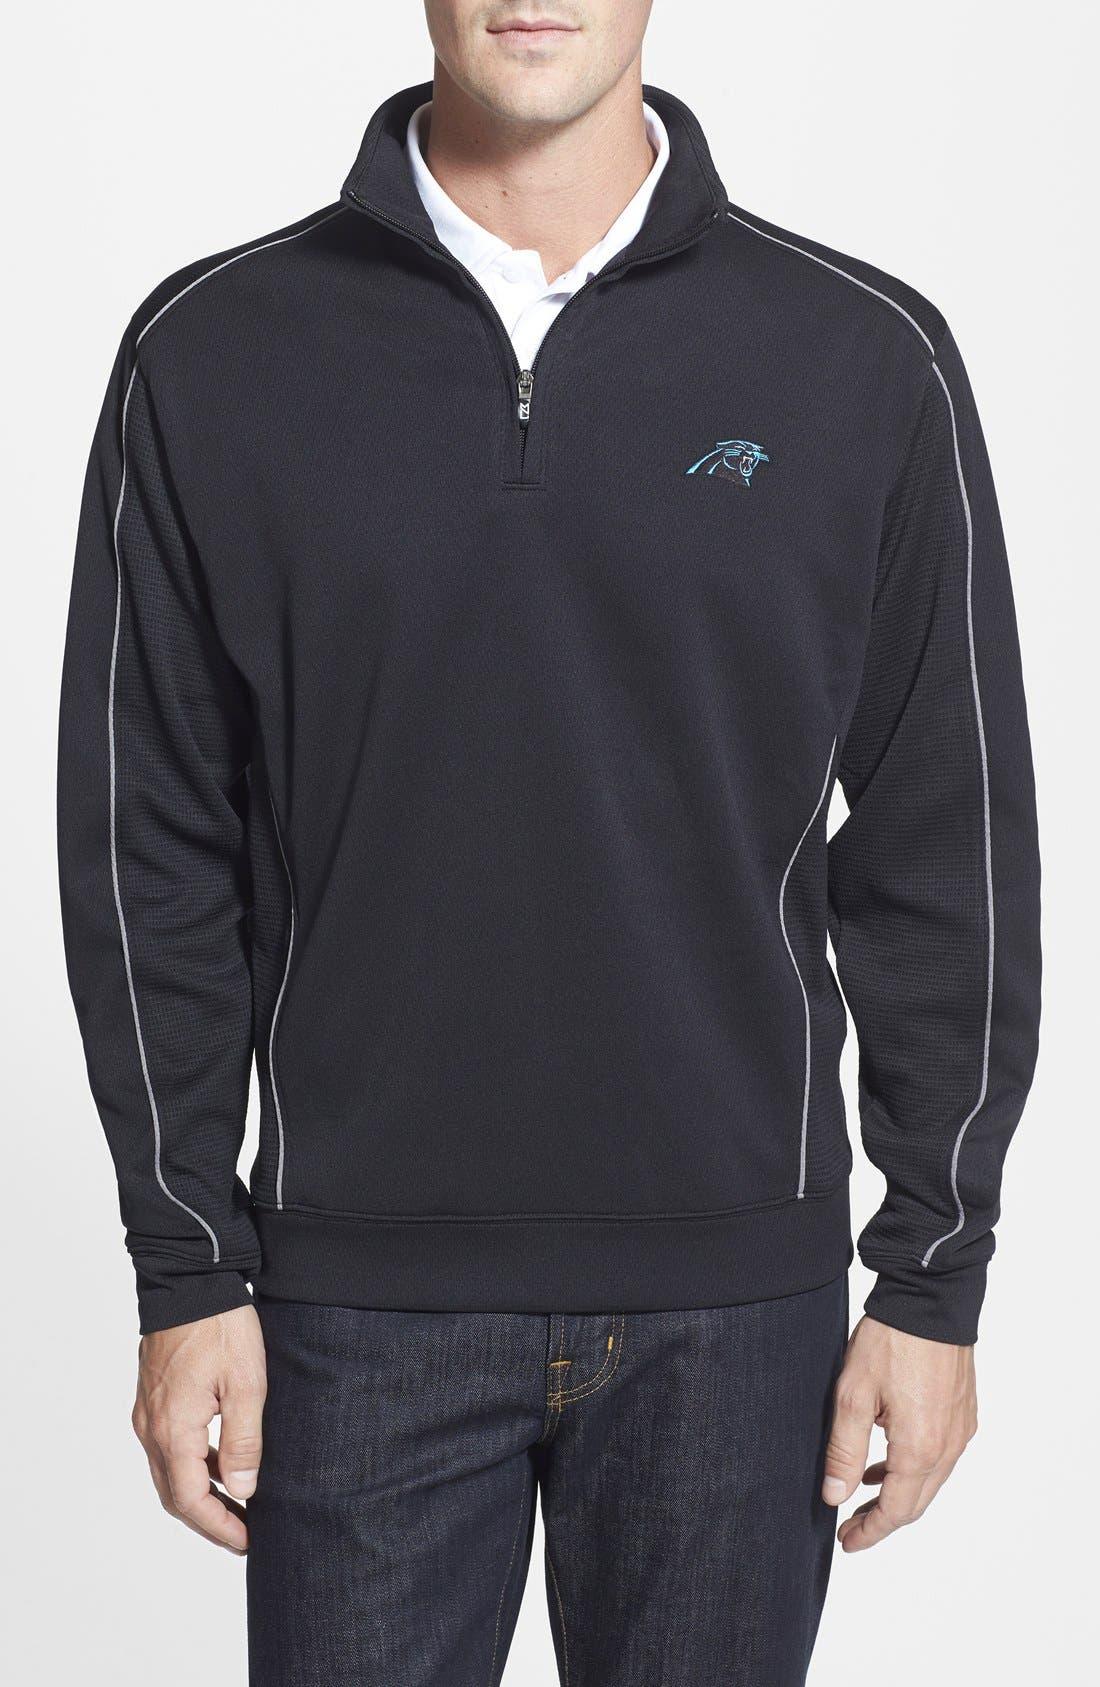 Carolina Panthers - Edge DryTec Moisture Wicking Half Zip Pullover,                         Main,                         color, Black